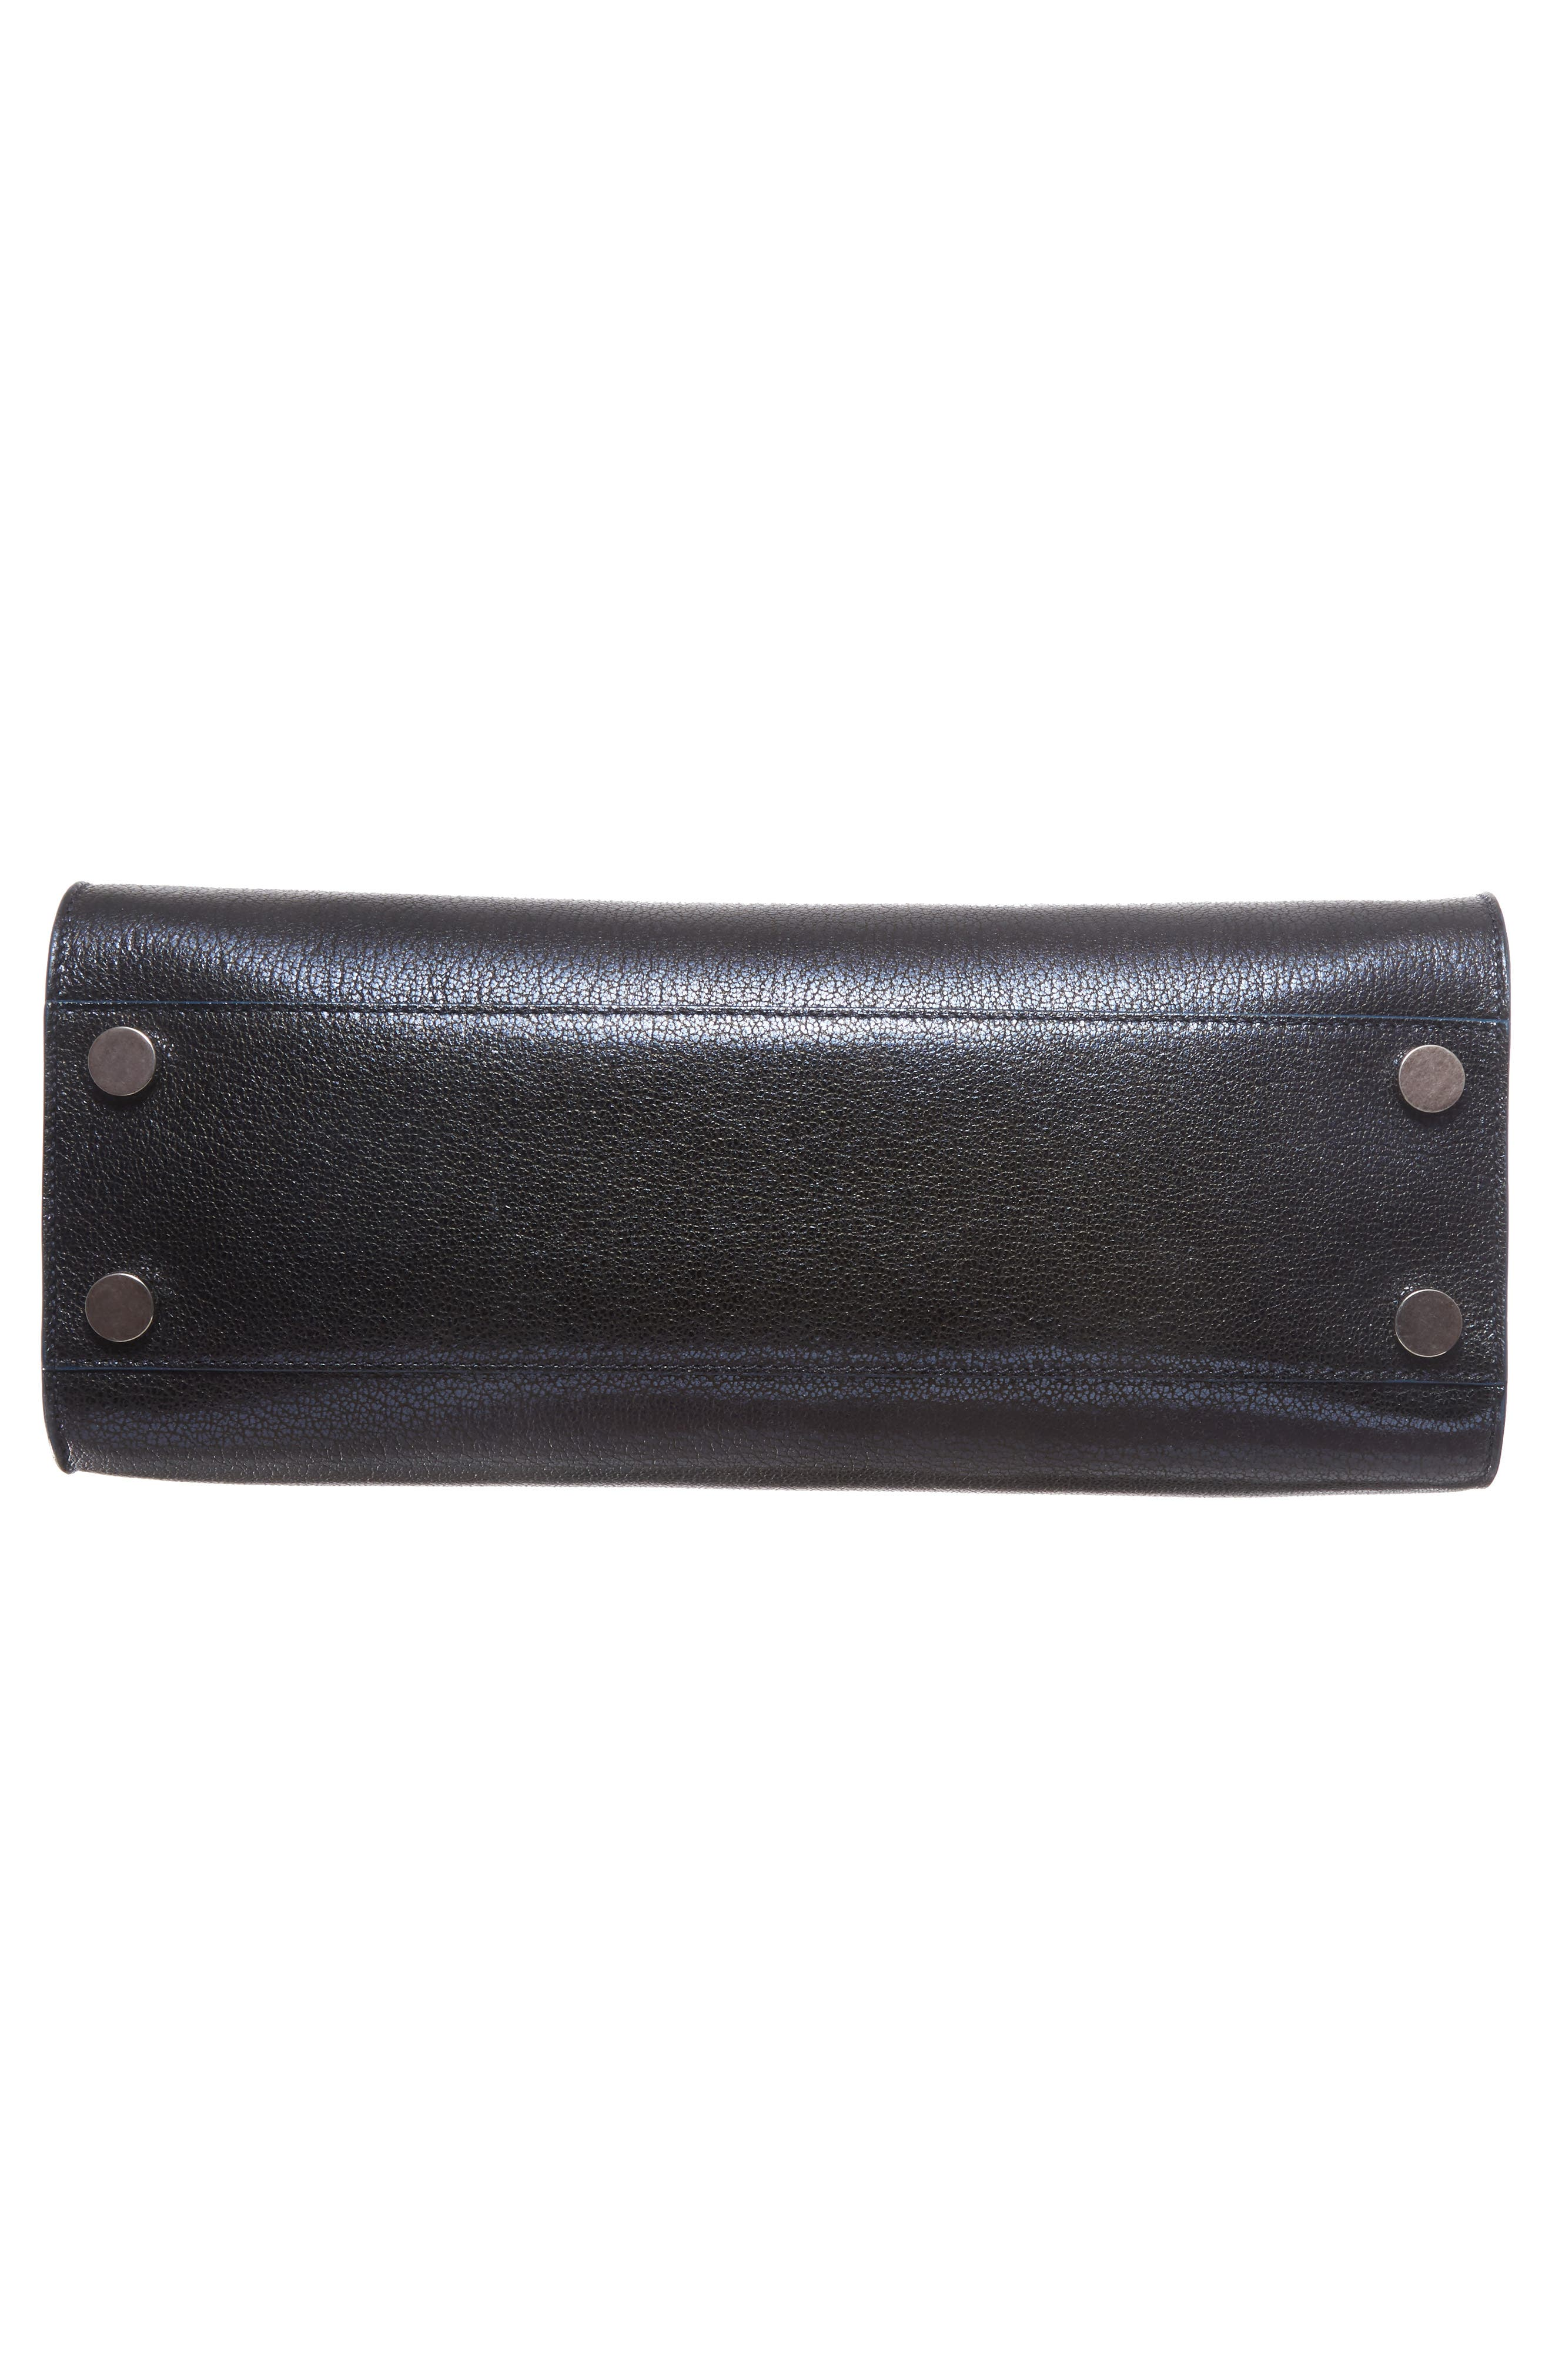 Medium Riley Metallic Leather Tote,                             Alternate thumbnail 6, color,                             400